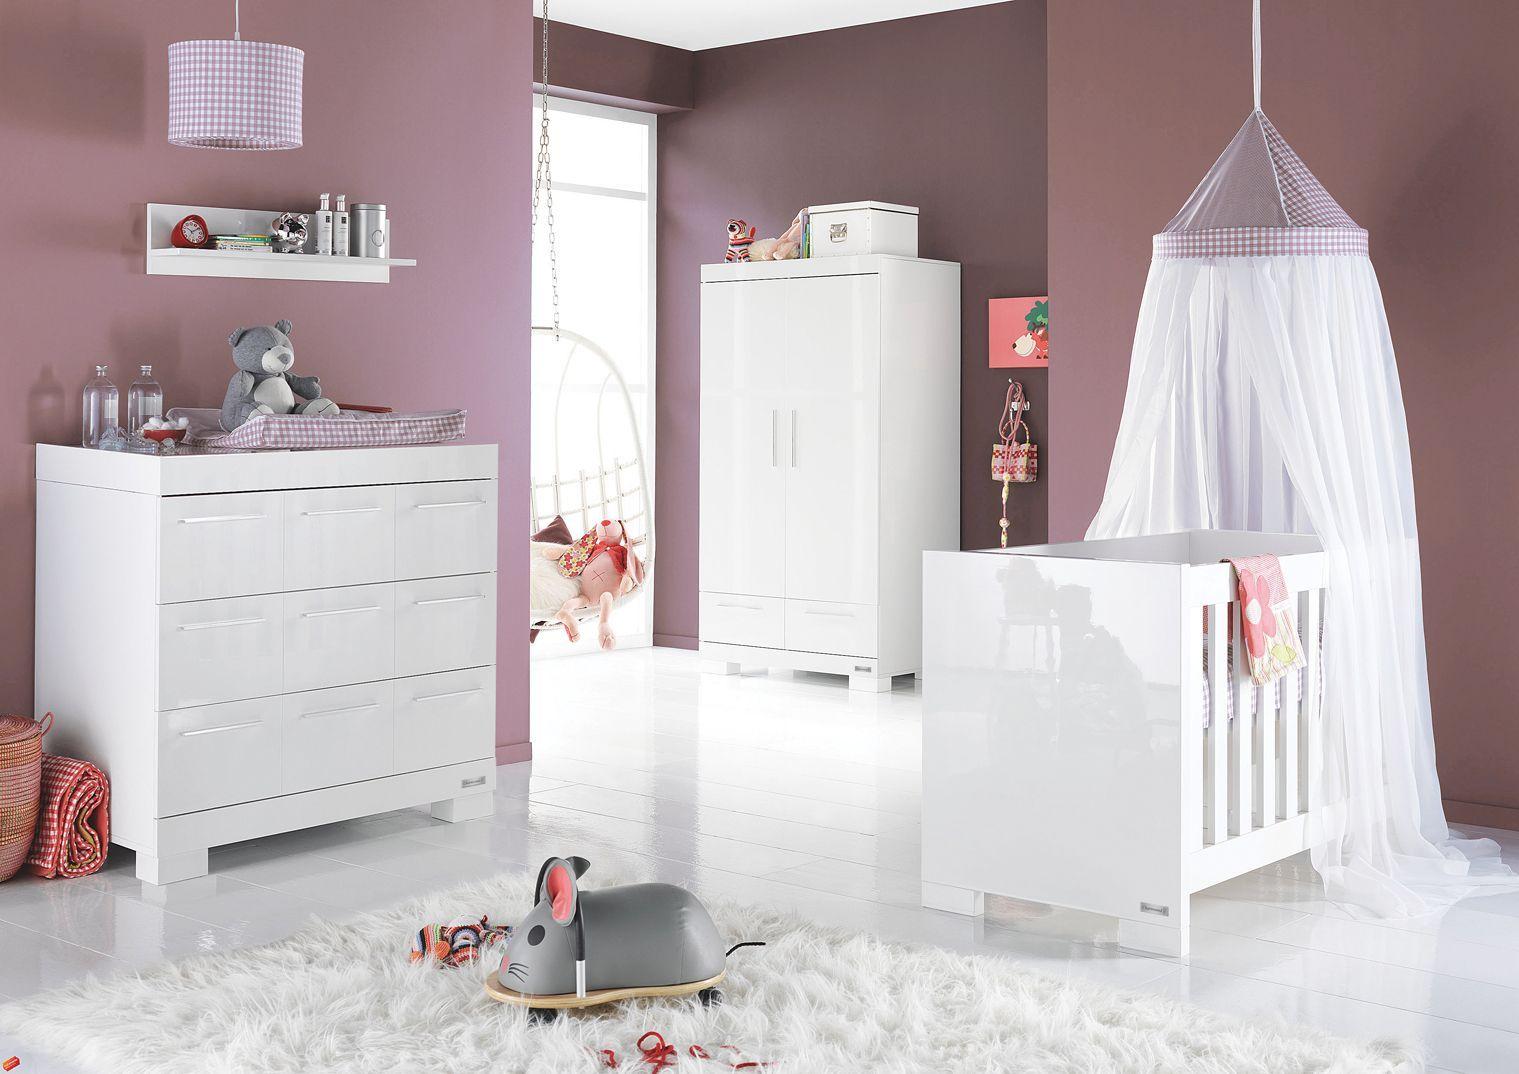 Babystyle Aspen Nursery Furniture Set